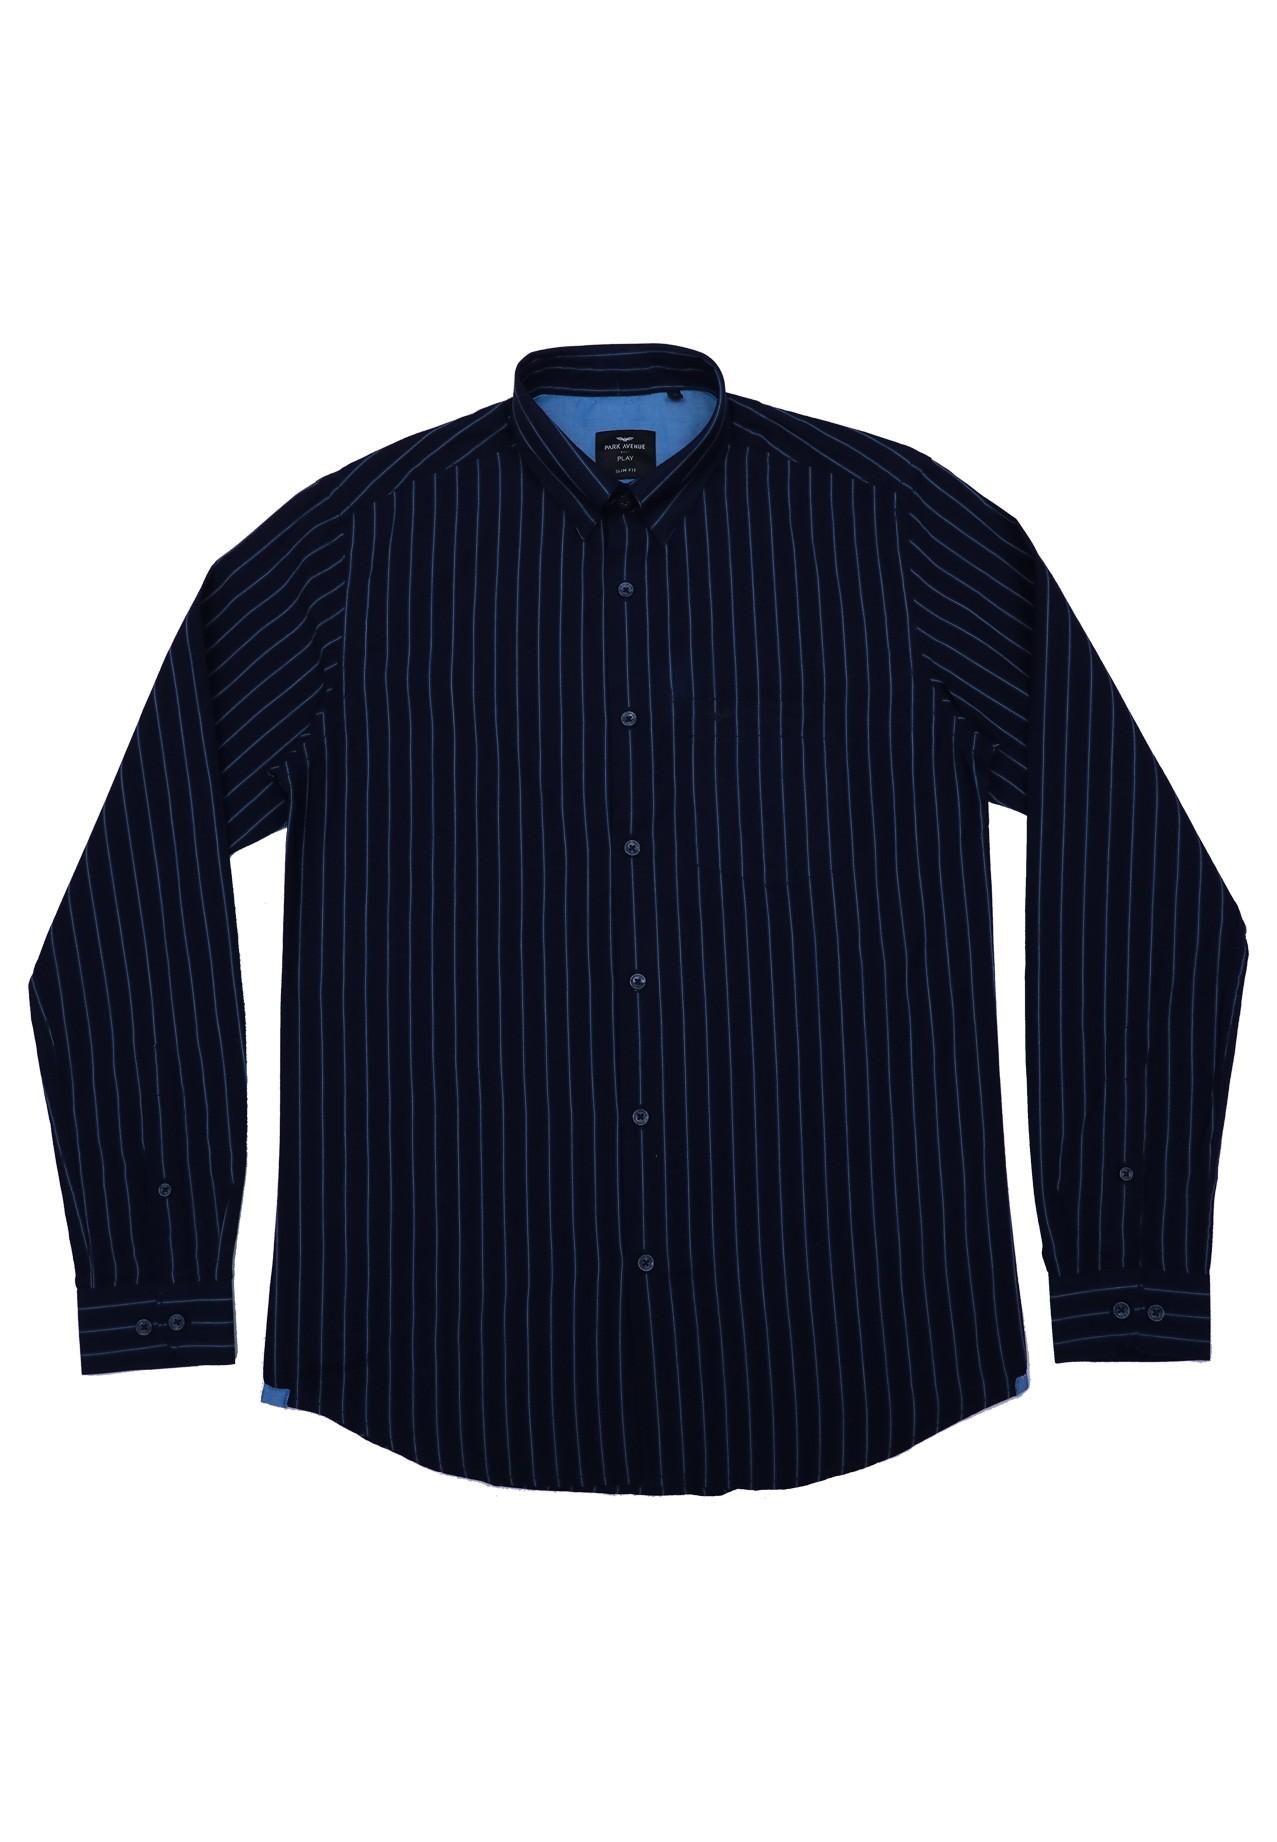 Park Avenue PCSA01884-B7 Mens Shirt, Size 40